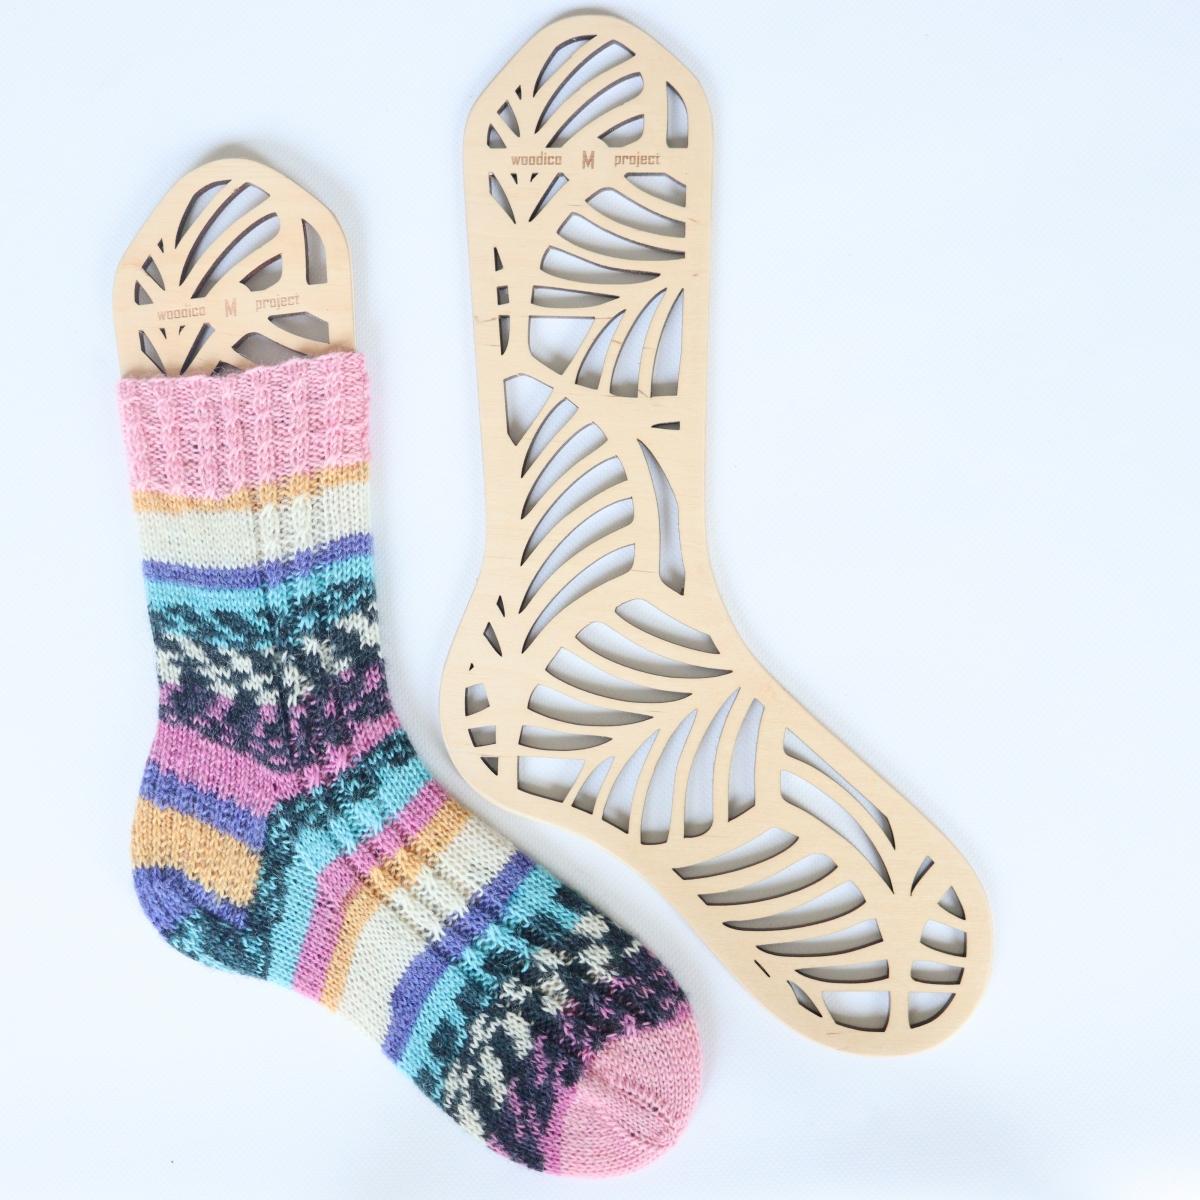 woodico.pro wooden sock blockers monstera 1200x1200 - Wooden sock blockers / Monstera